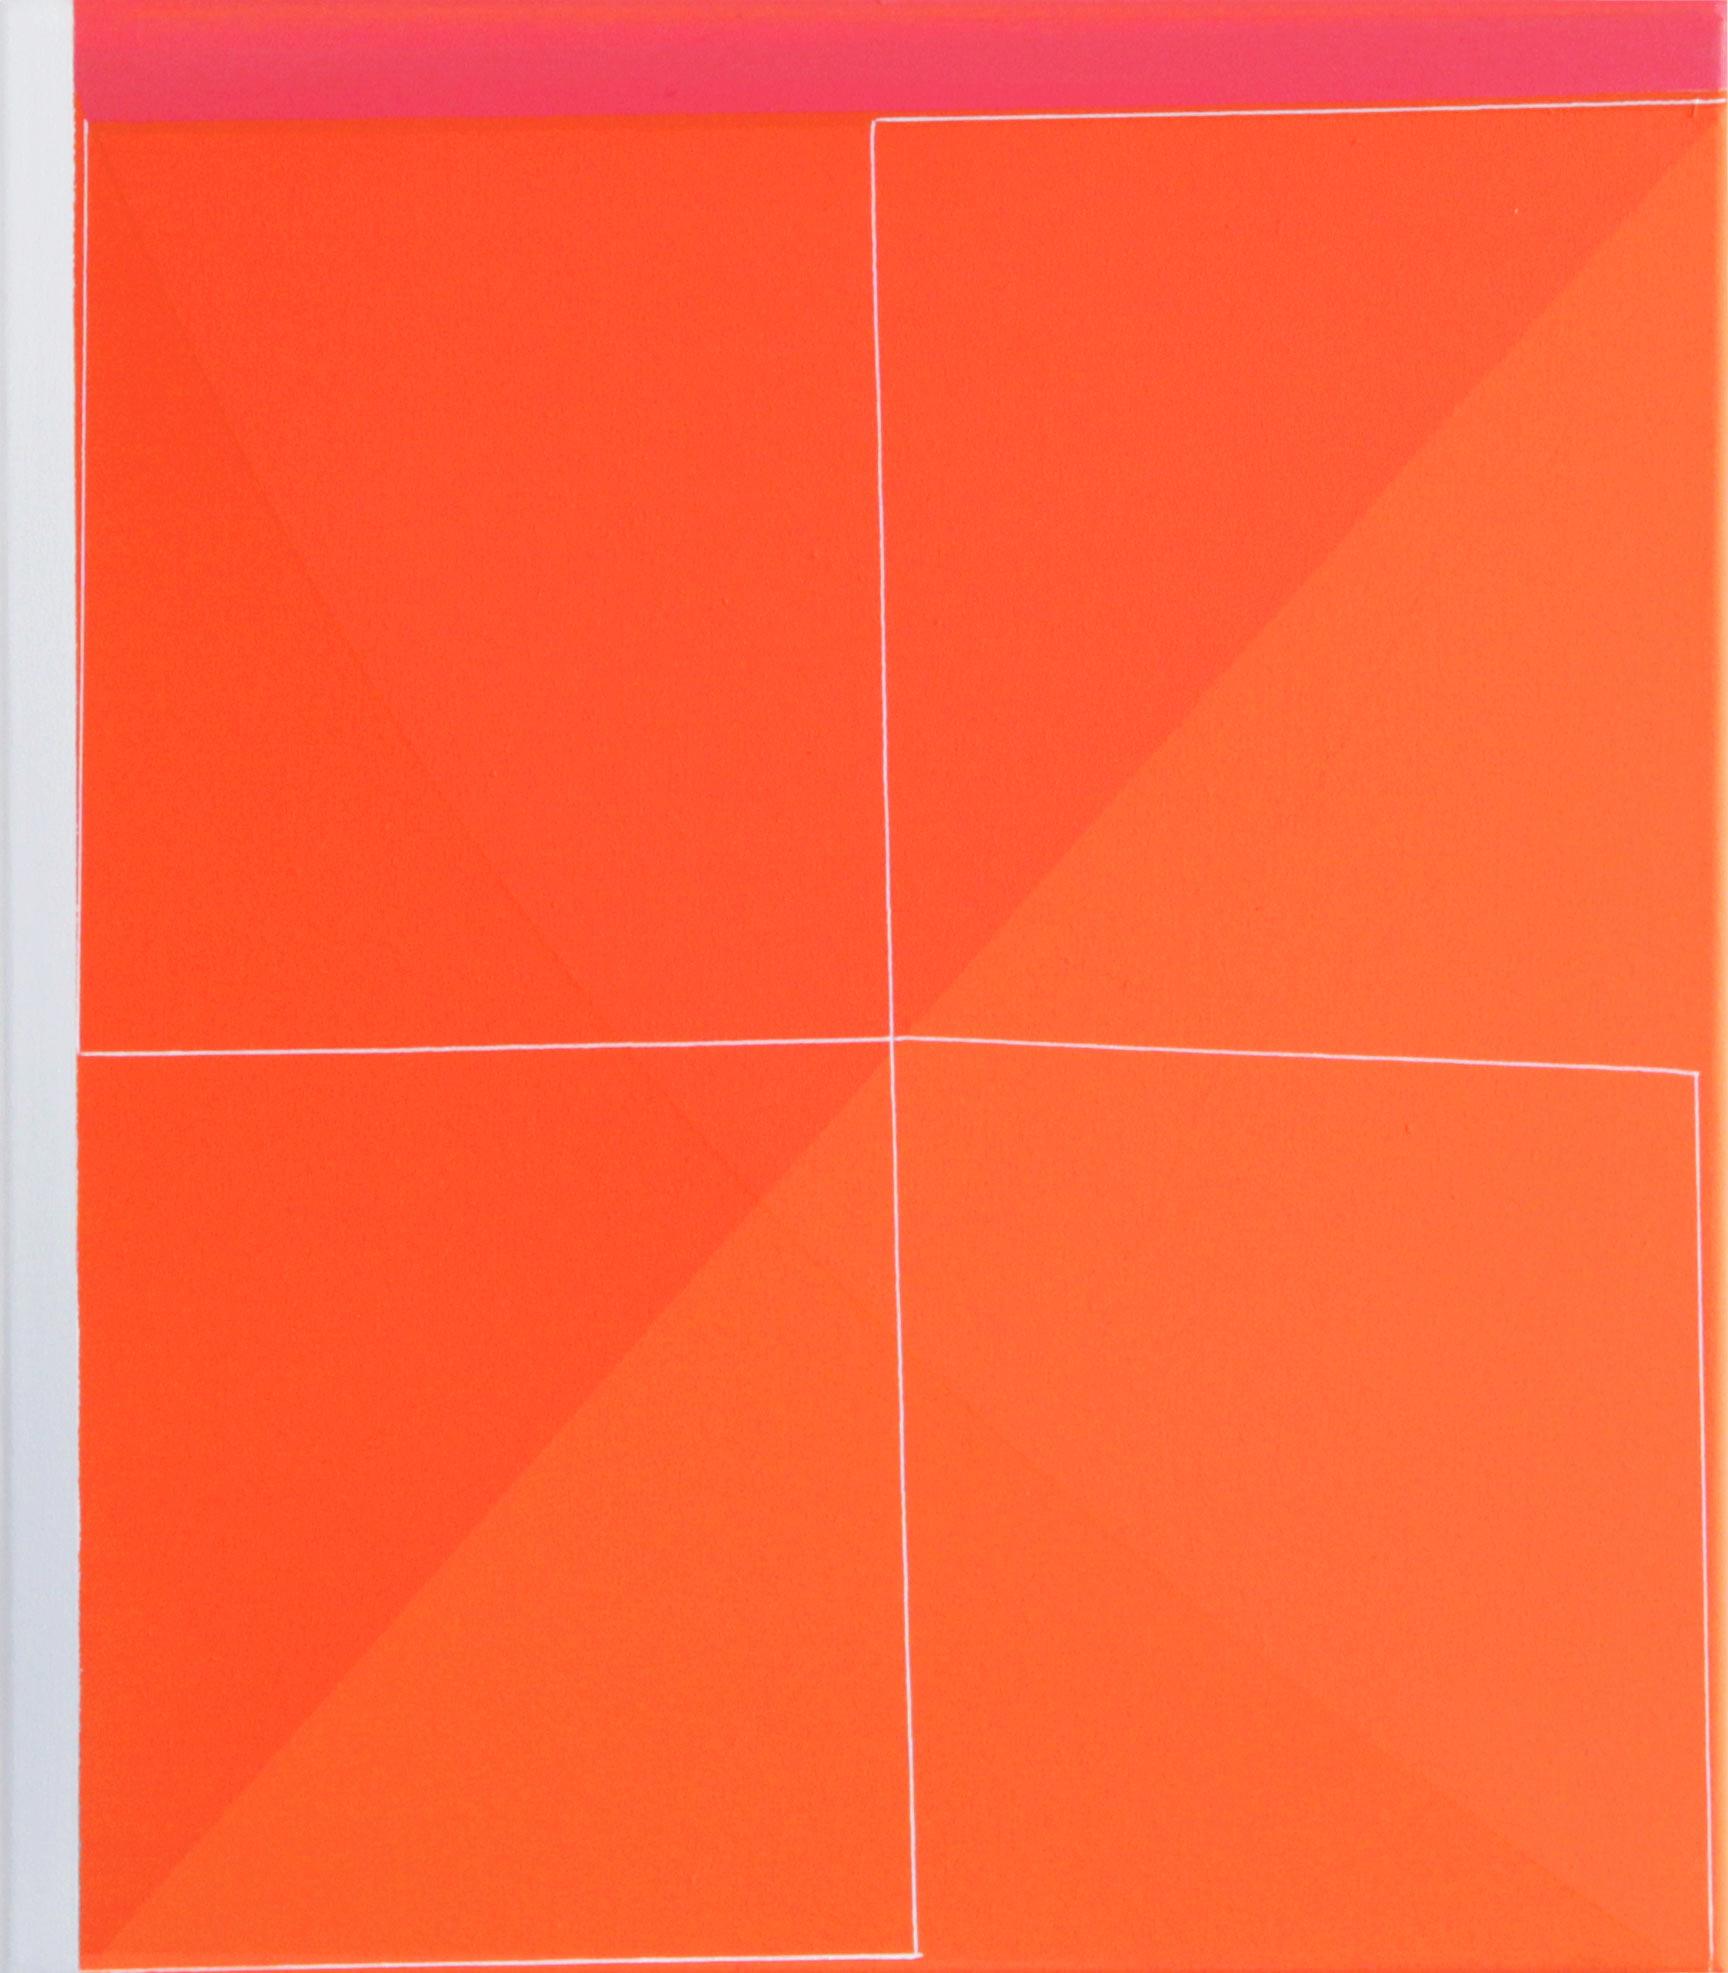 Daniel Hörner, Haken III, 52 x 45 cm, Öl auf Leinwand, 2014